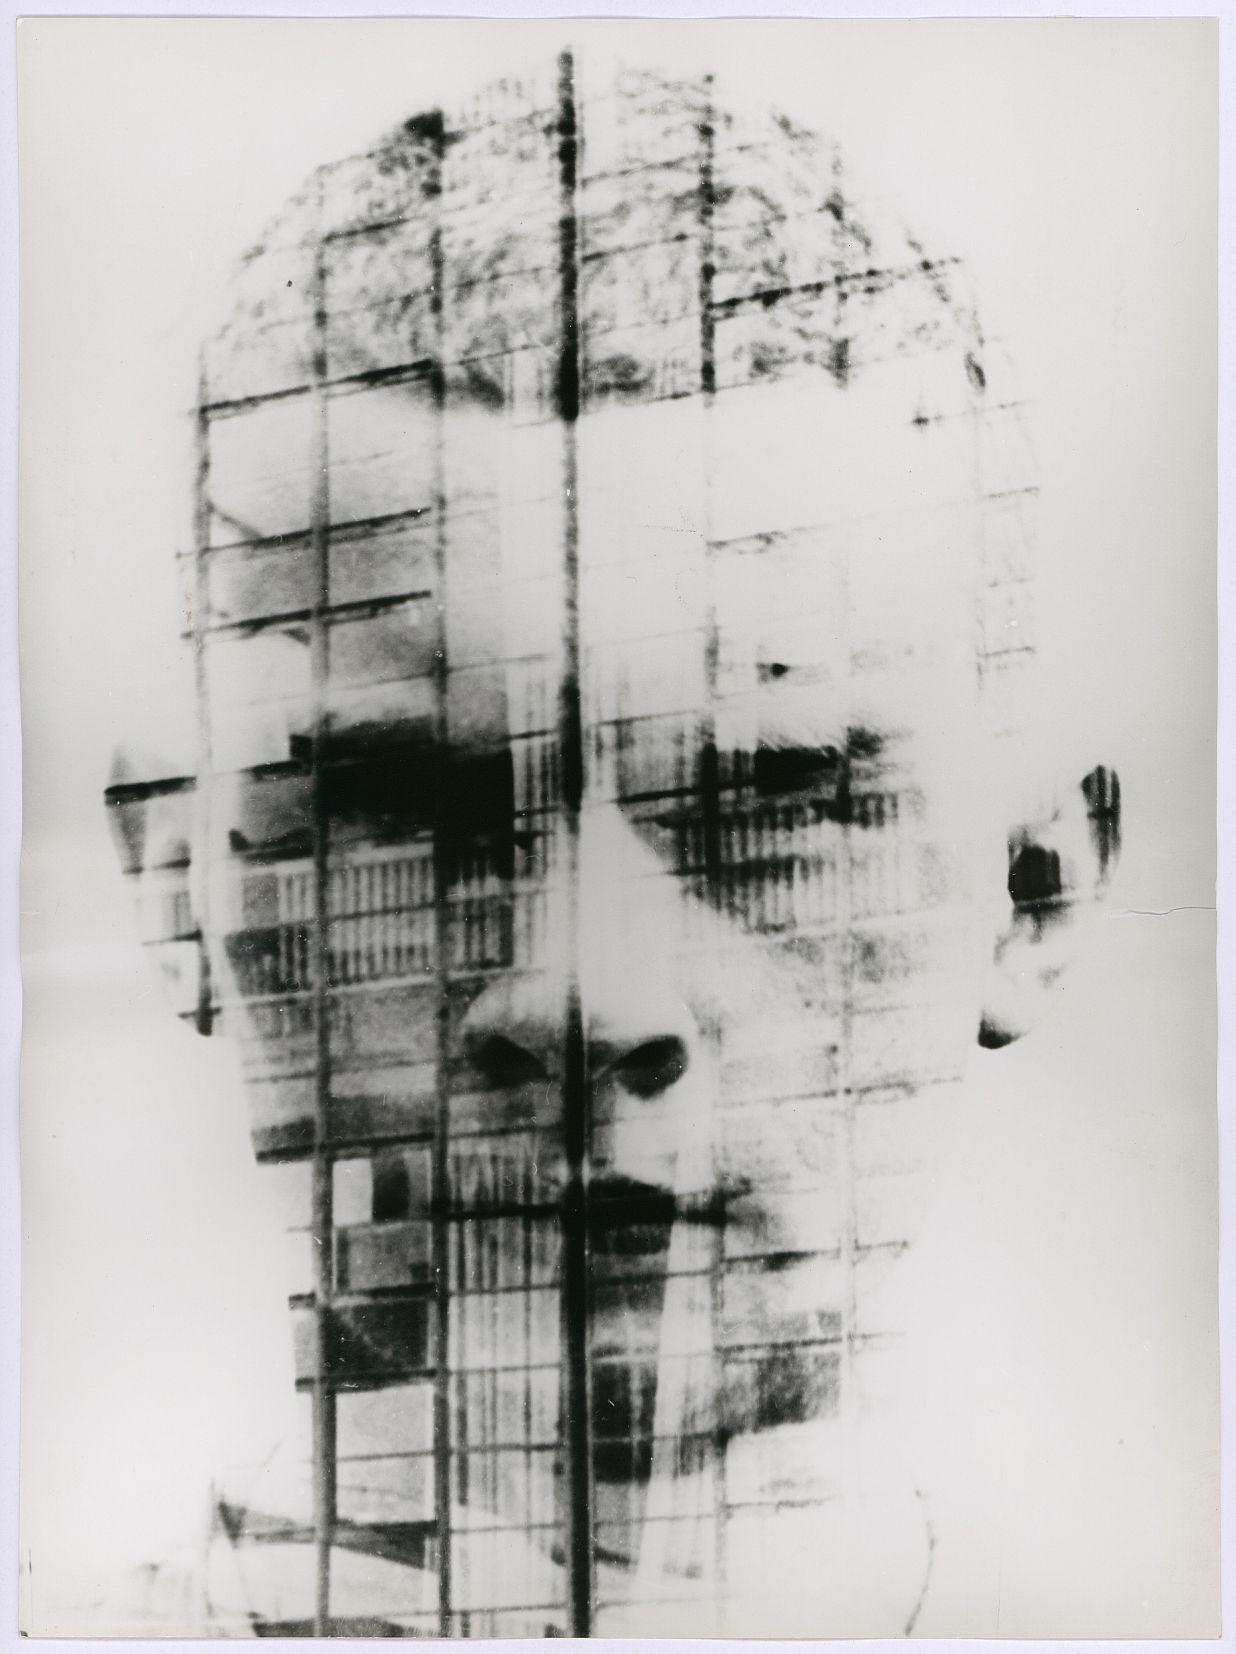 Hajo Rose: A self-portrait combined with the facade of Bauhaus Dessau